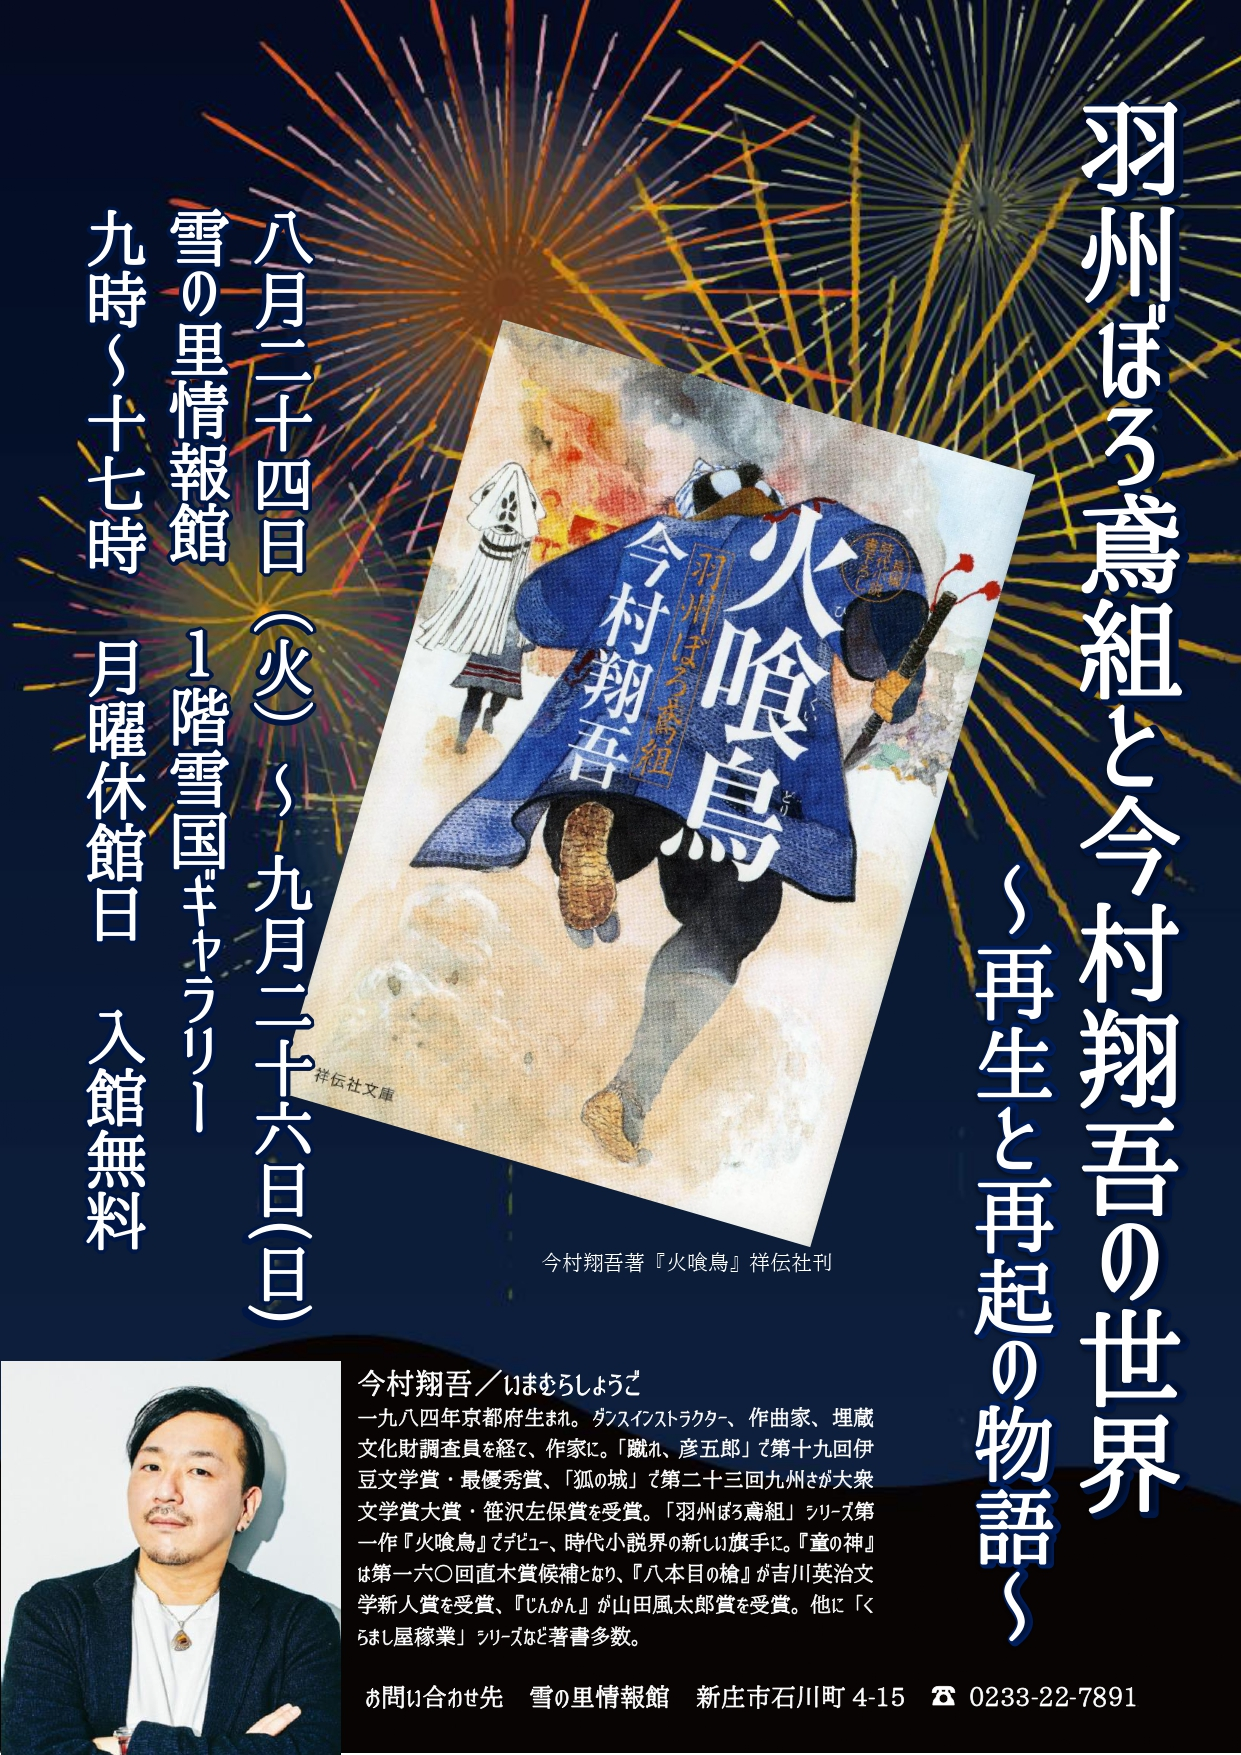 R3-5【9月】ぼろ鳶展ポスター_page-0001